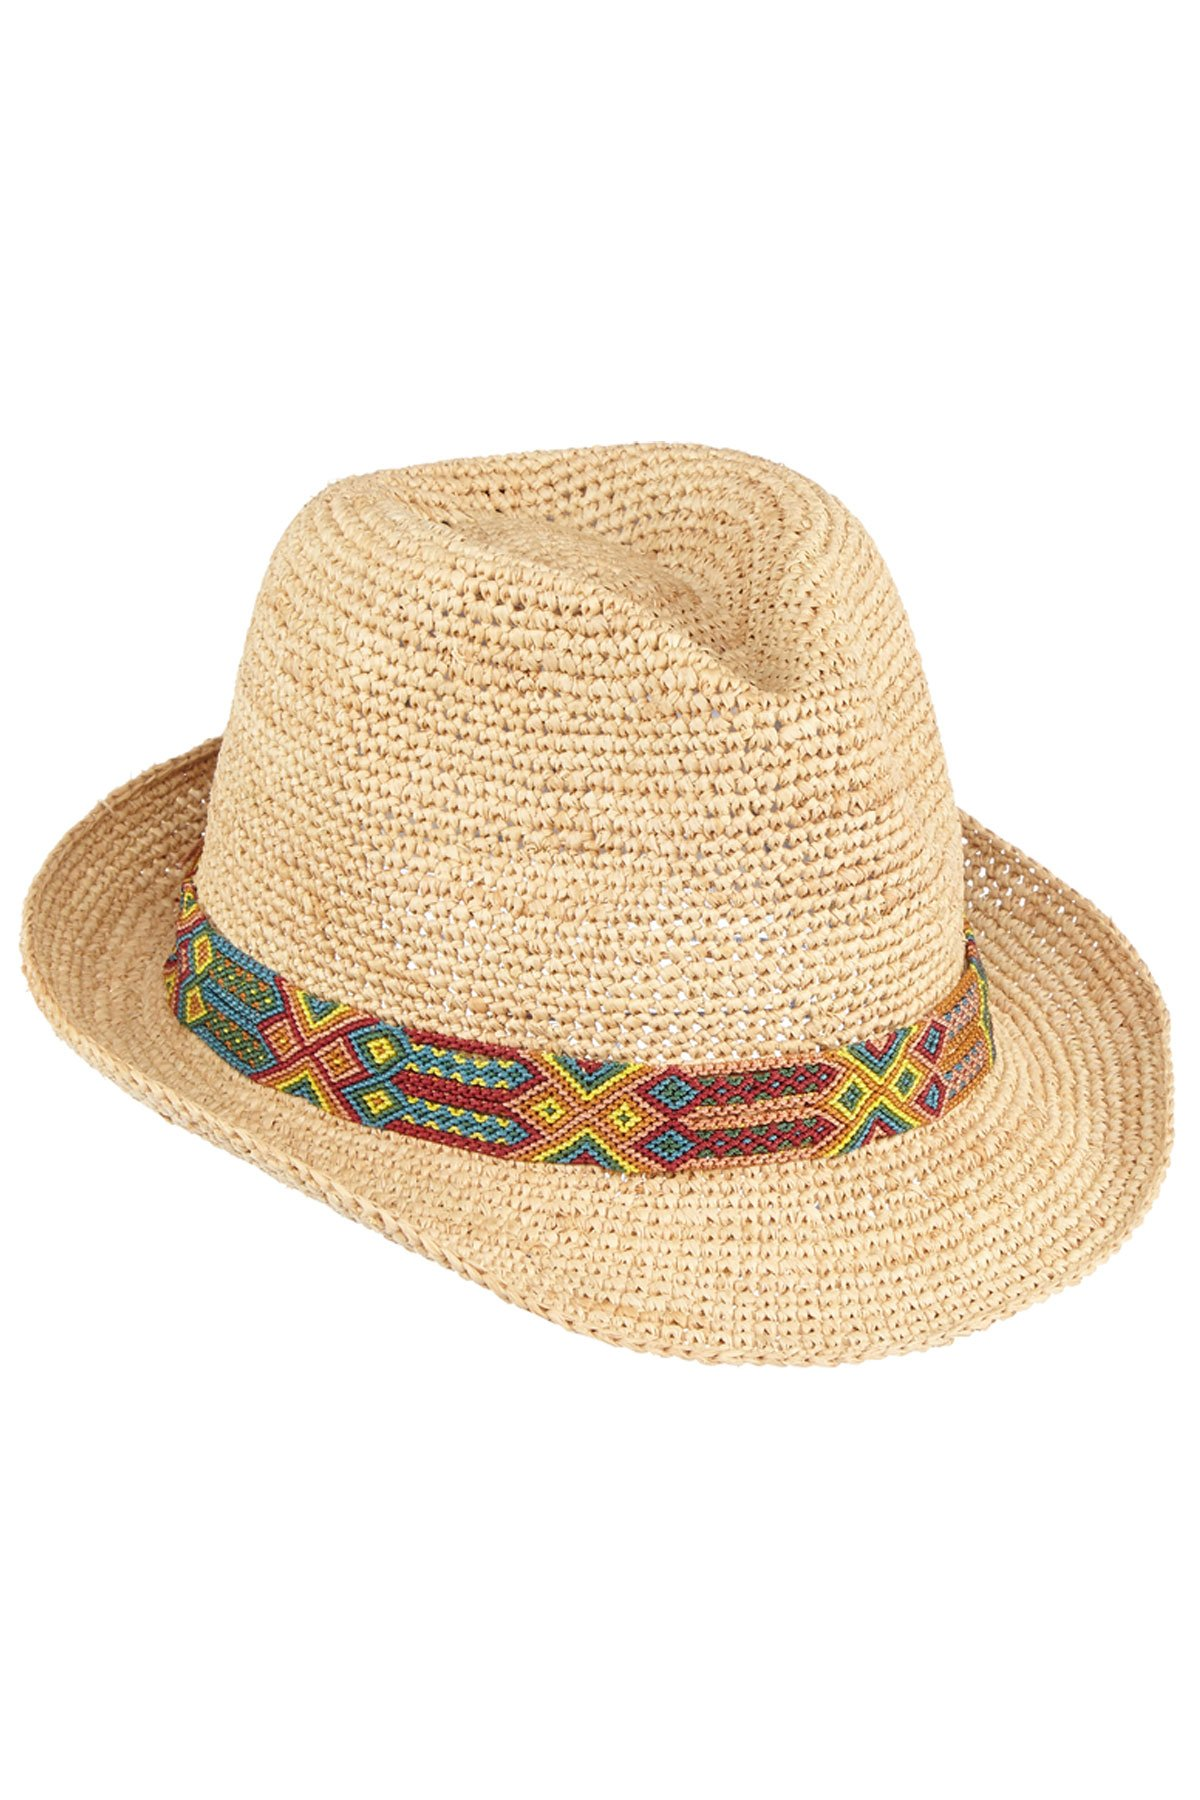 Florabella Women's Raffia Fedora Sun Hat Natural One